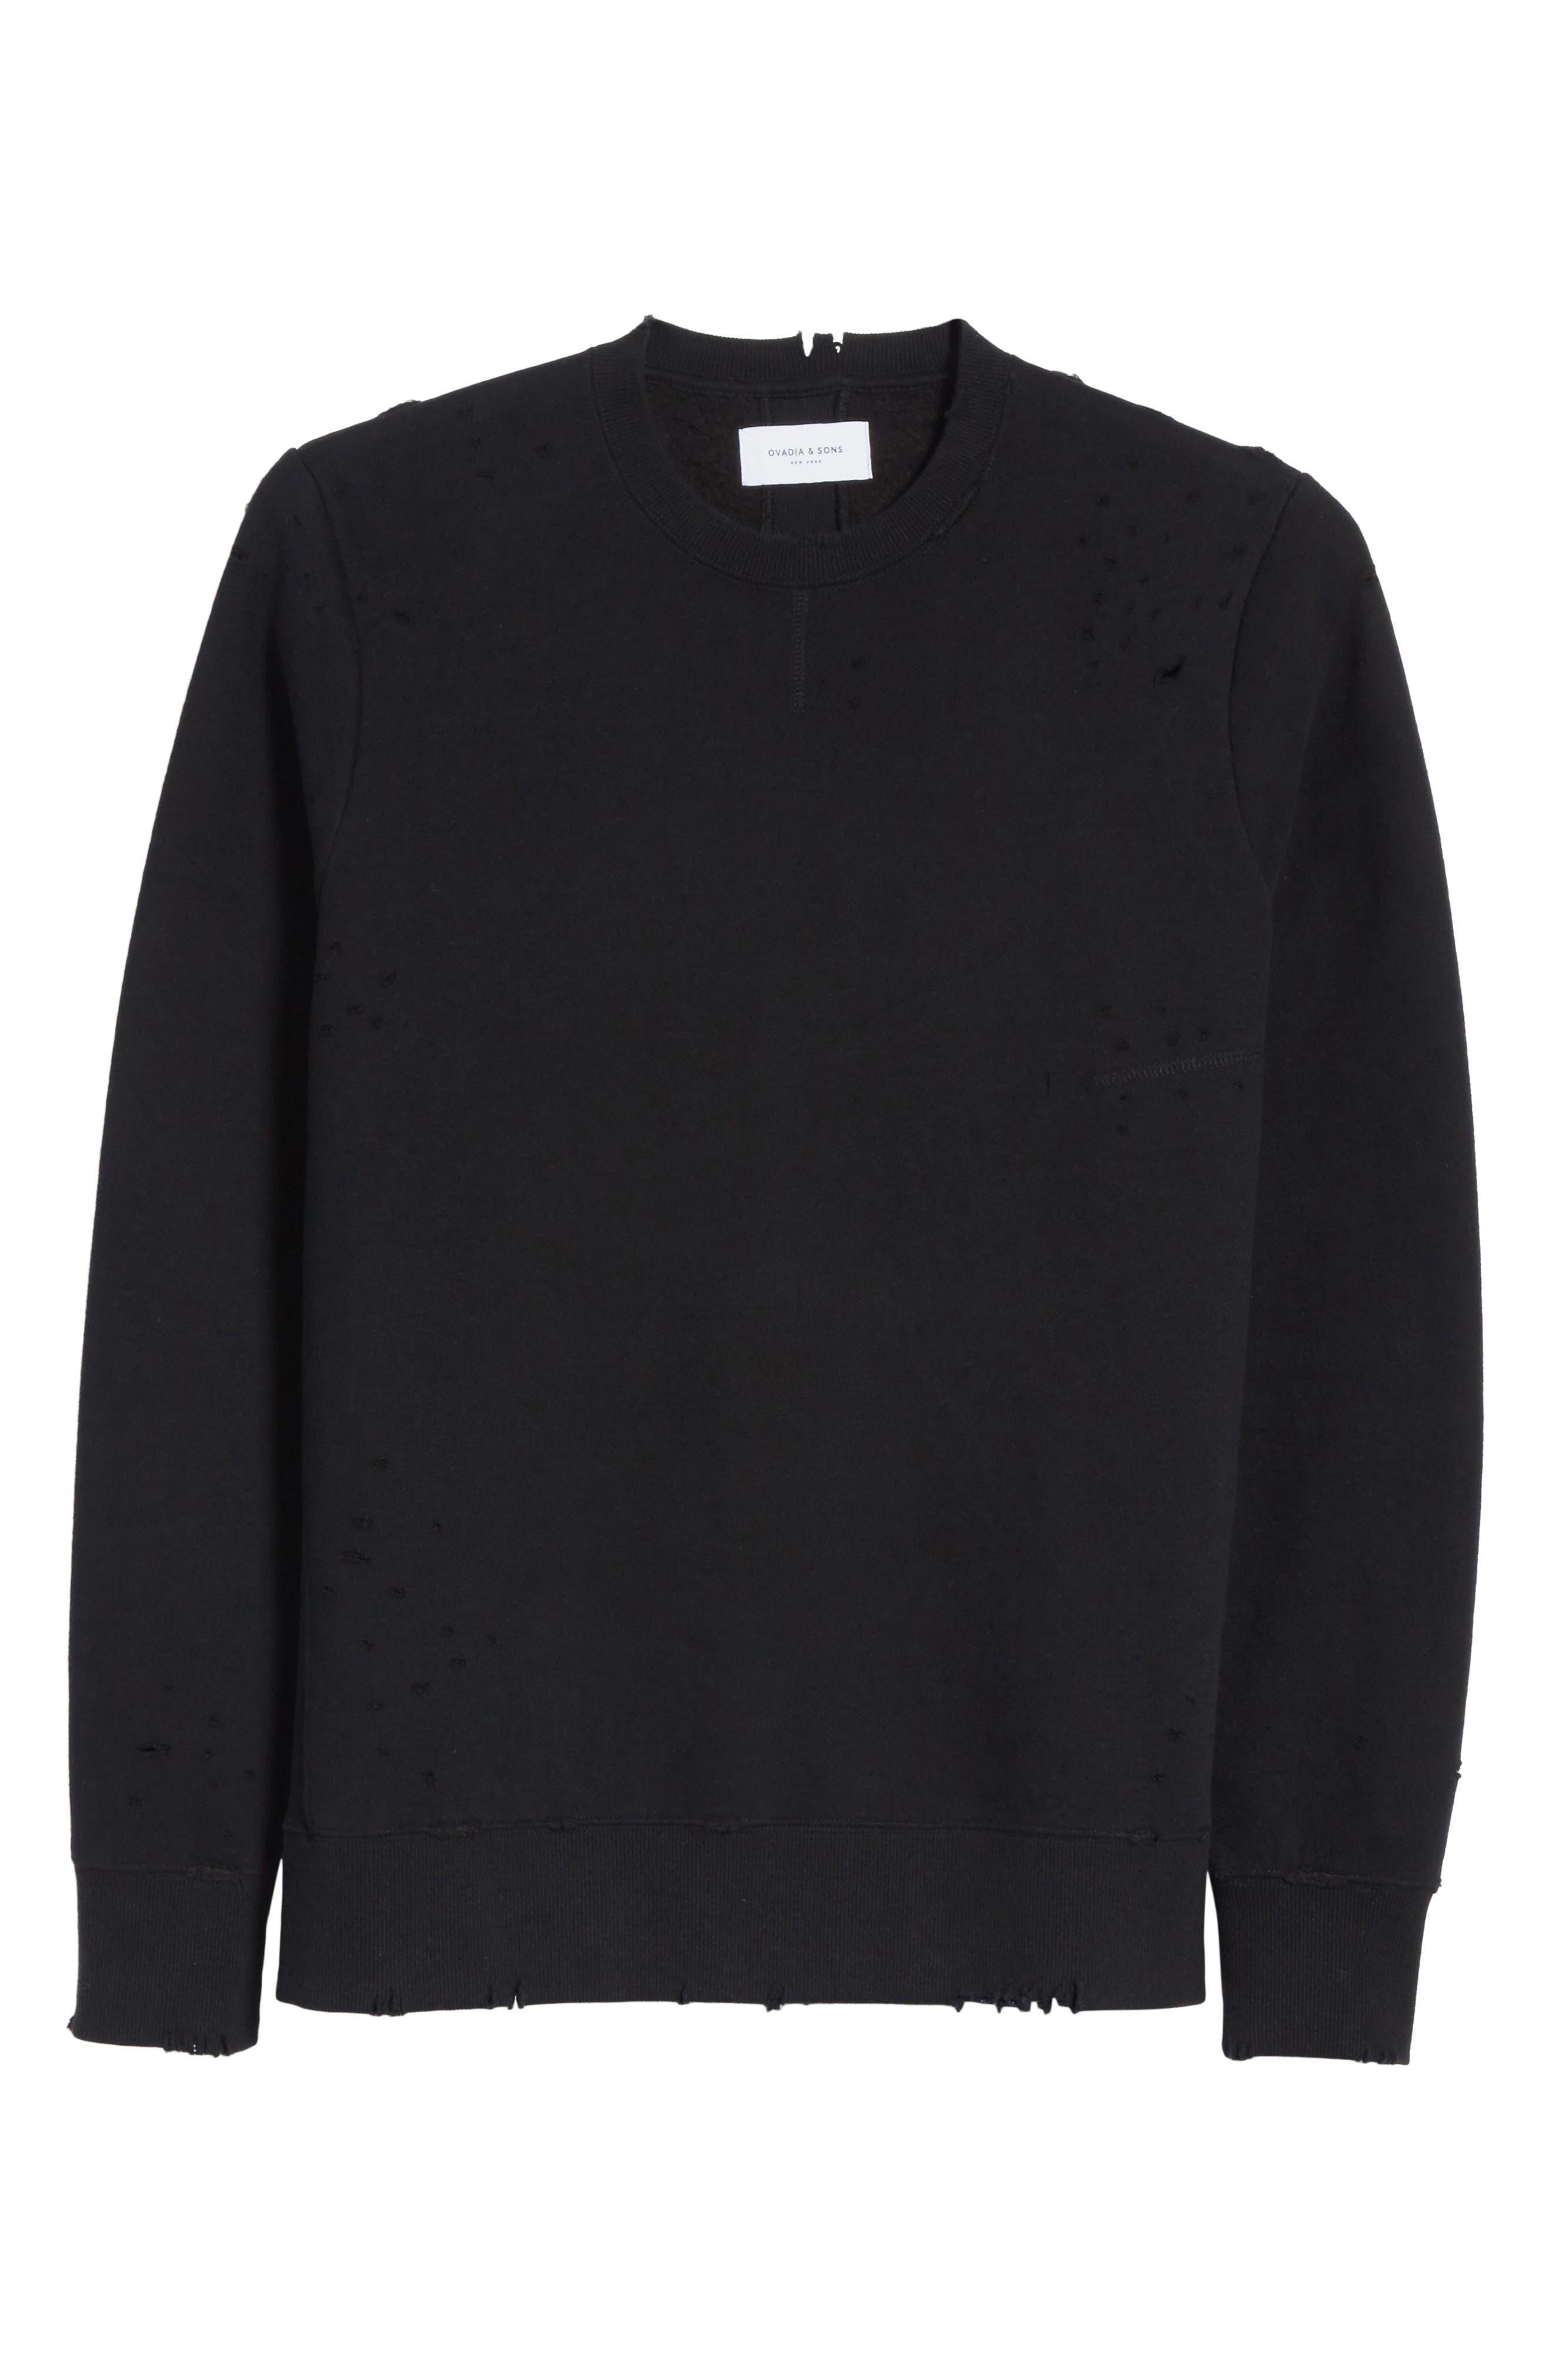 Distressed Crewneck Sweatshirt,                             Alternate thumbnail 6, color,                             001